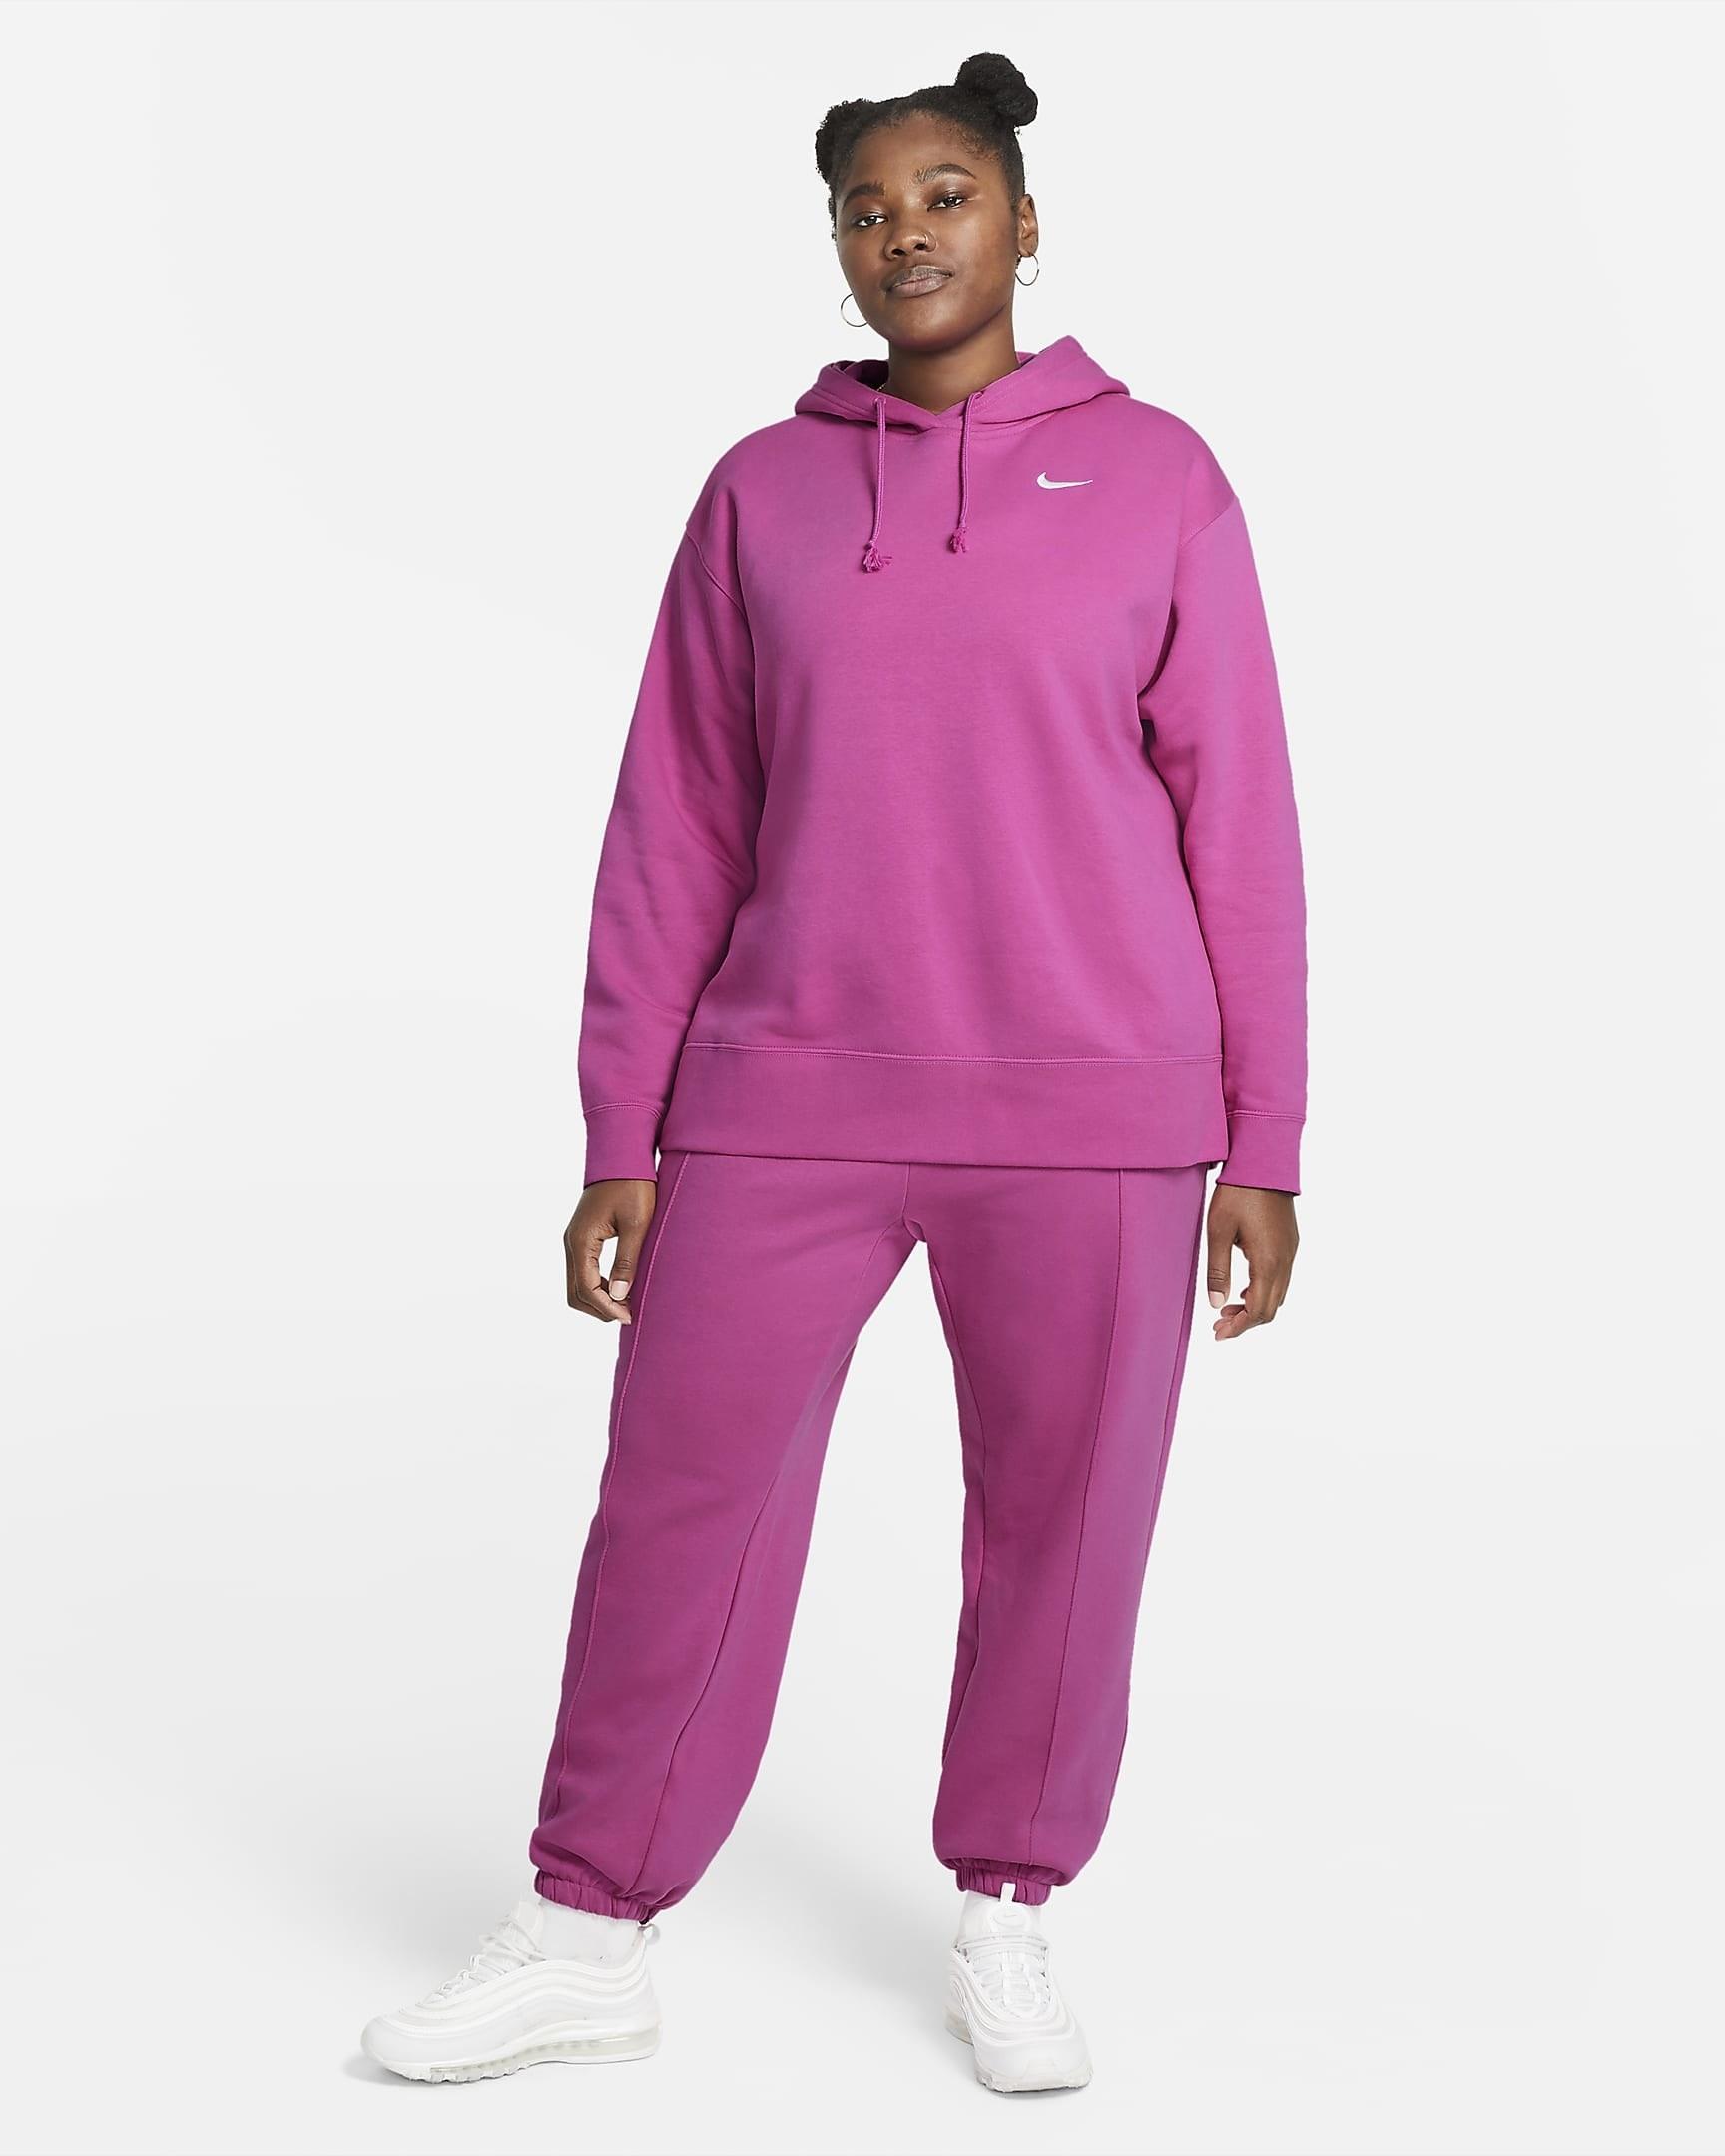 A person wearing a matching sweatshirt and sweatpants